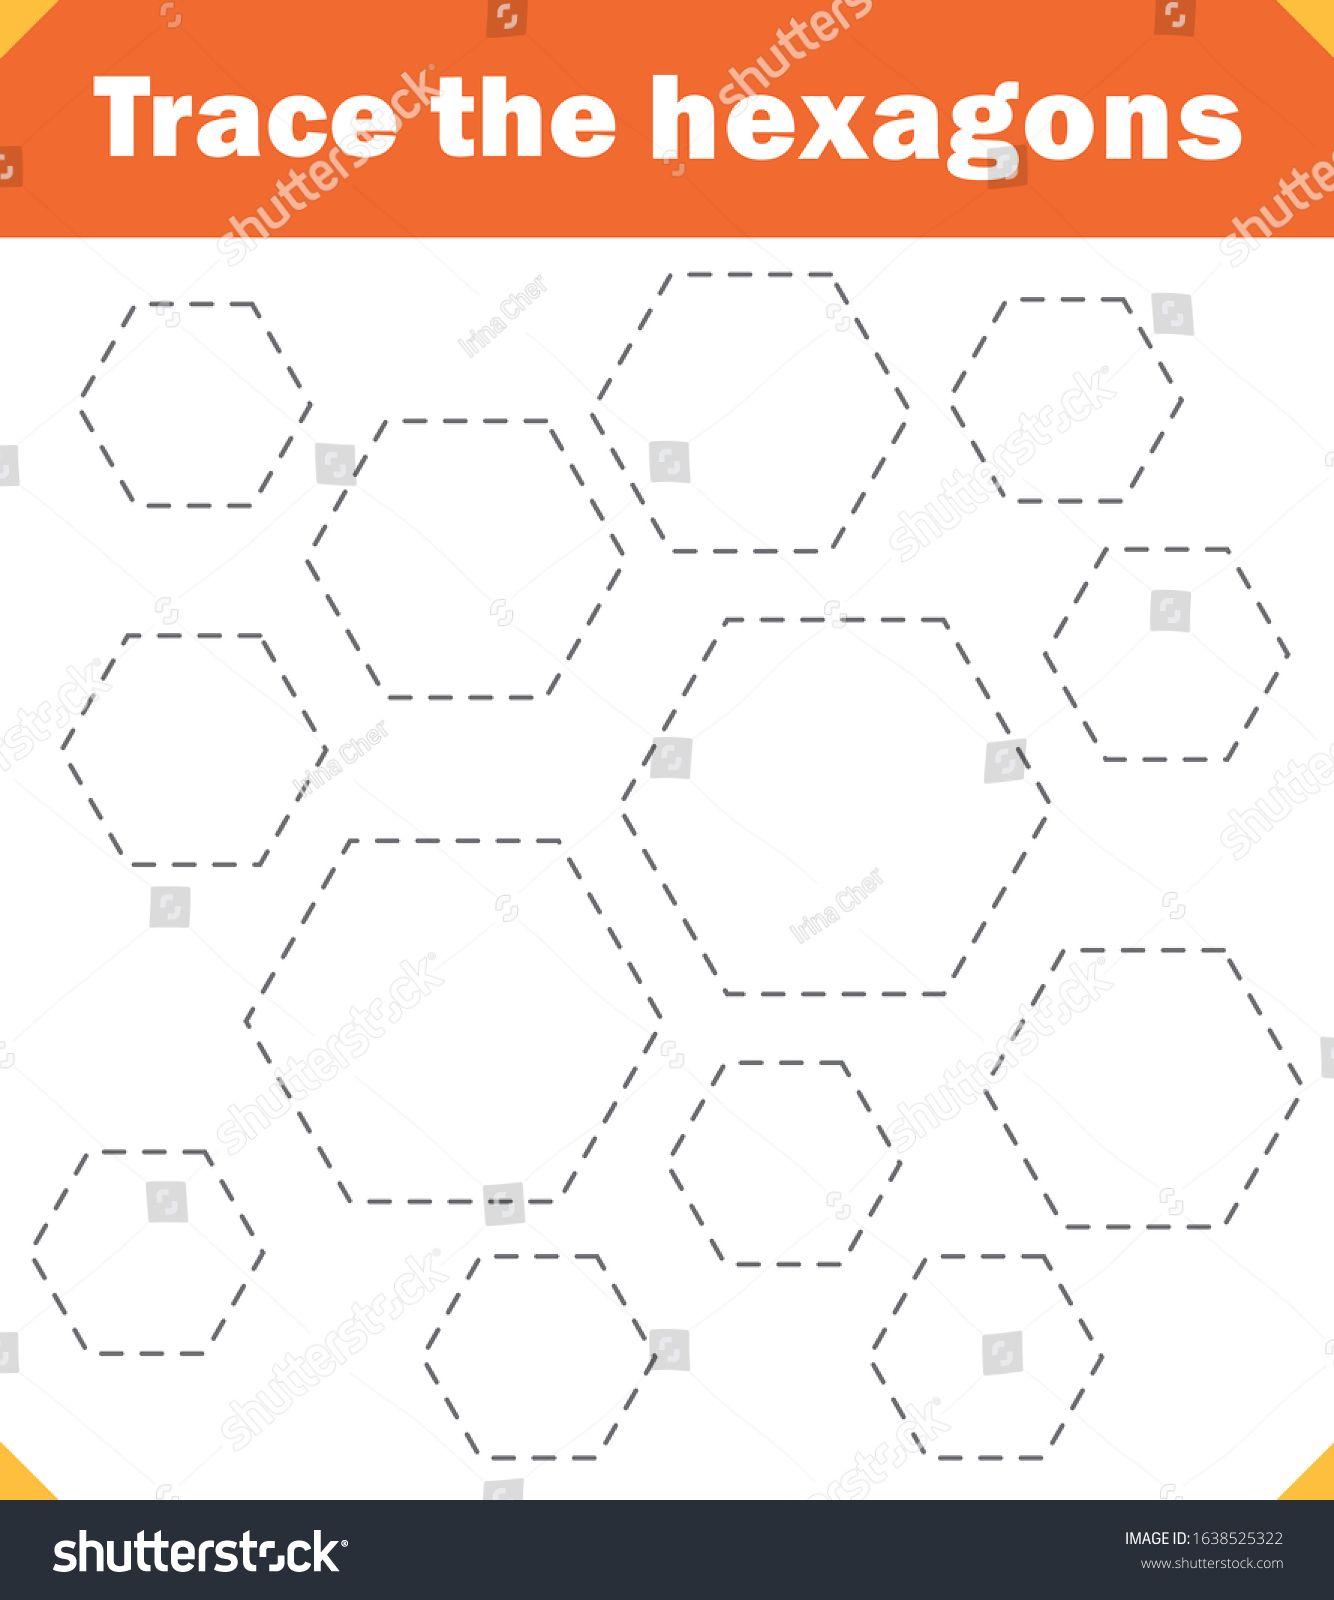 Preschool Worksheet Trace The Hexagons And Color Tracing Worksheet Ad Spon Trace Worksheet Preschool Hexago Business Photos Tracing Worksheets Graphing [ 1600 x 1334 Pixel ]